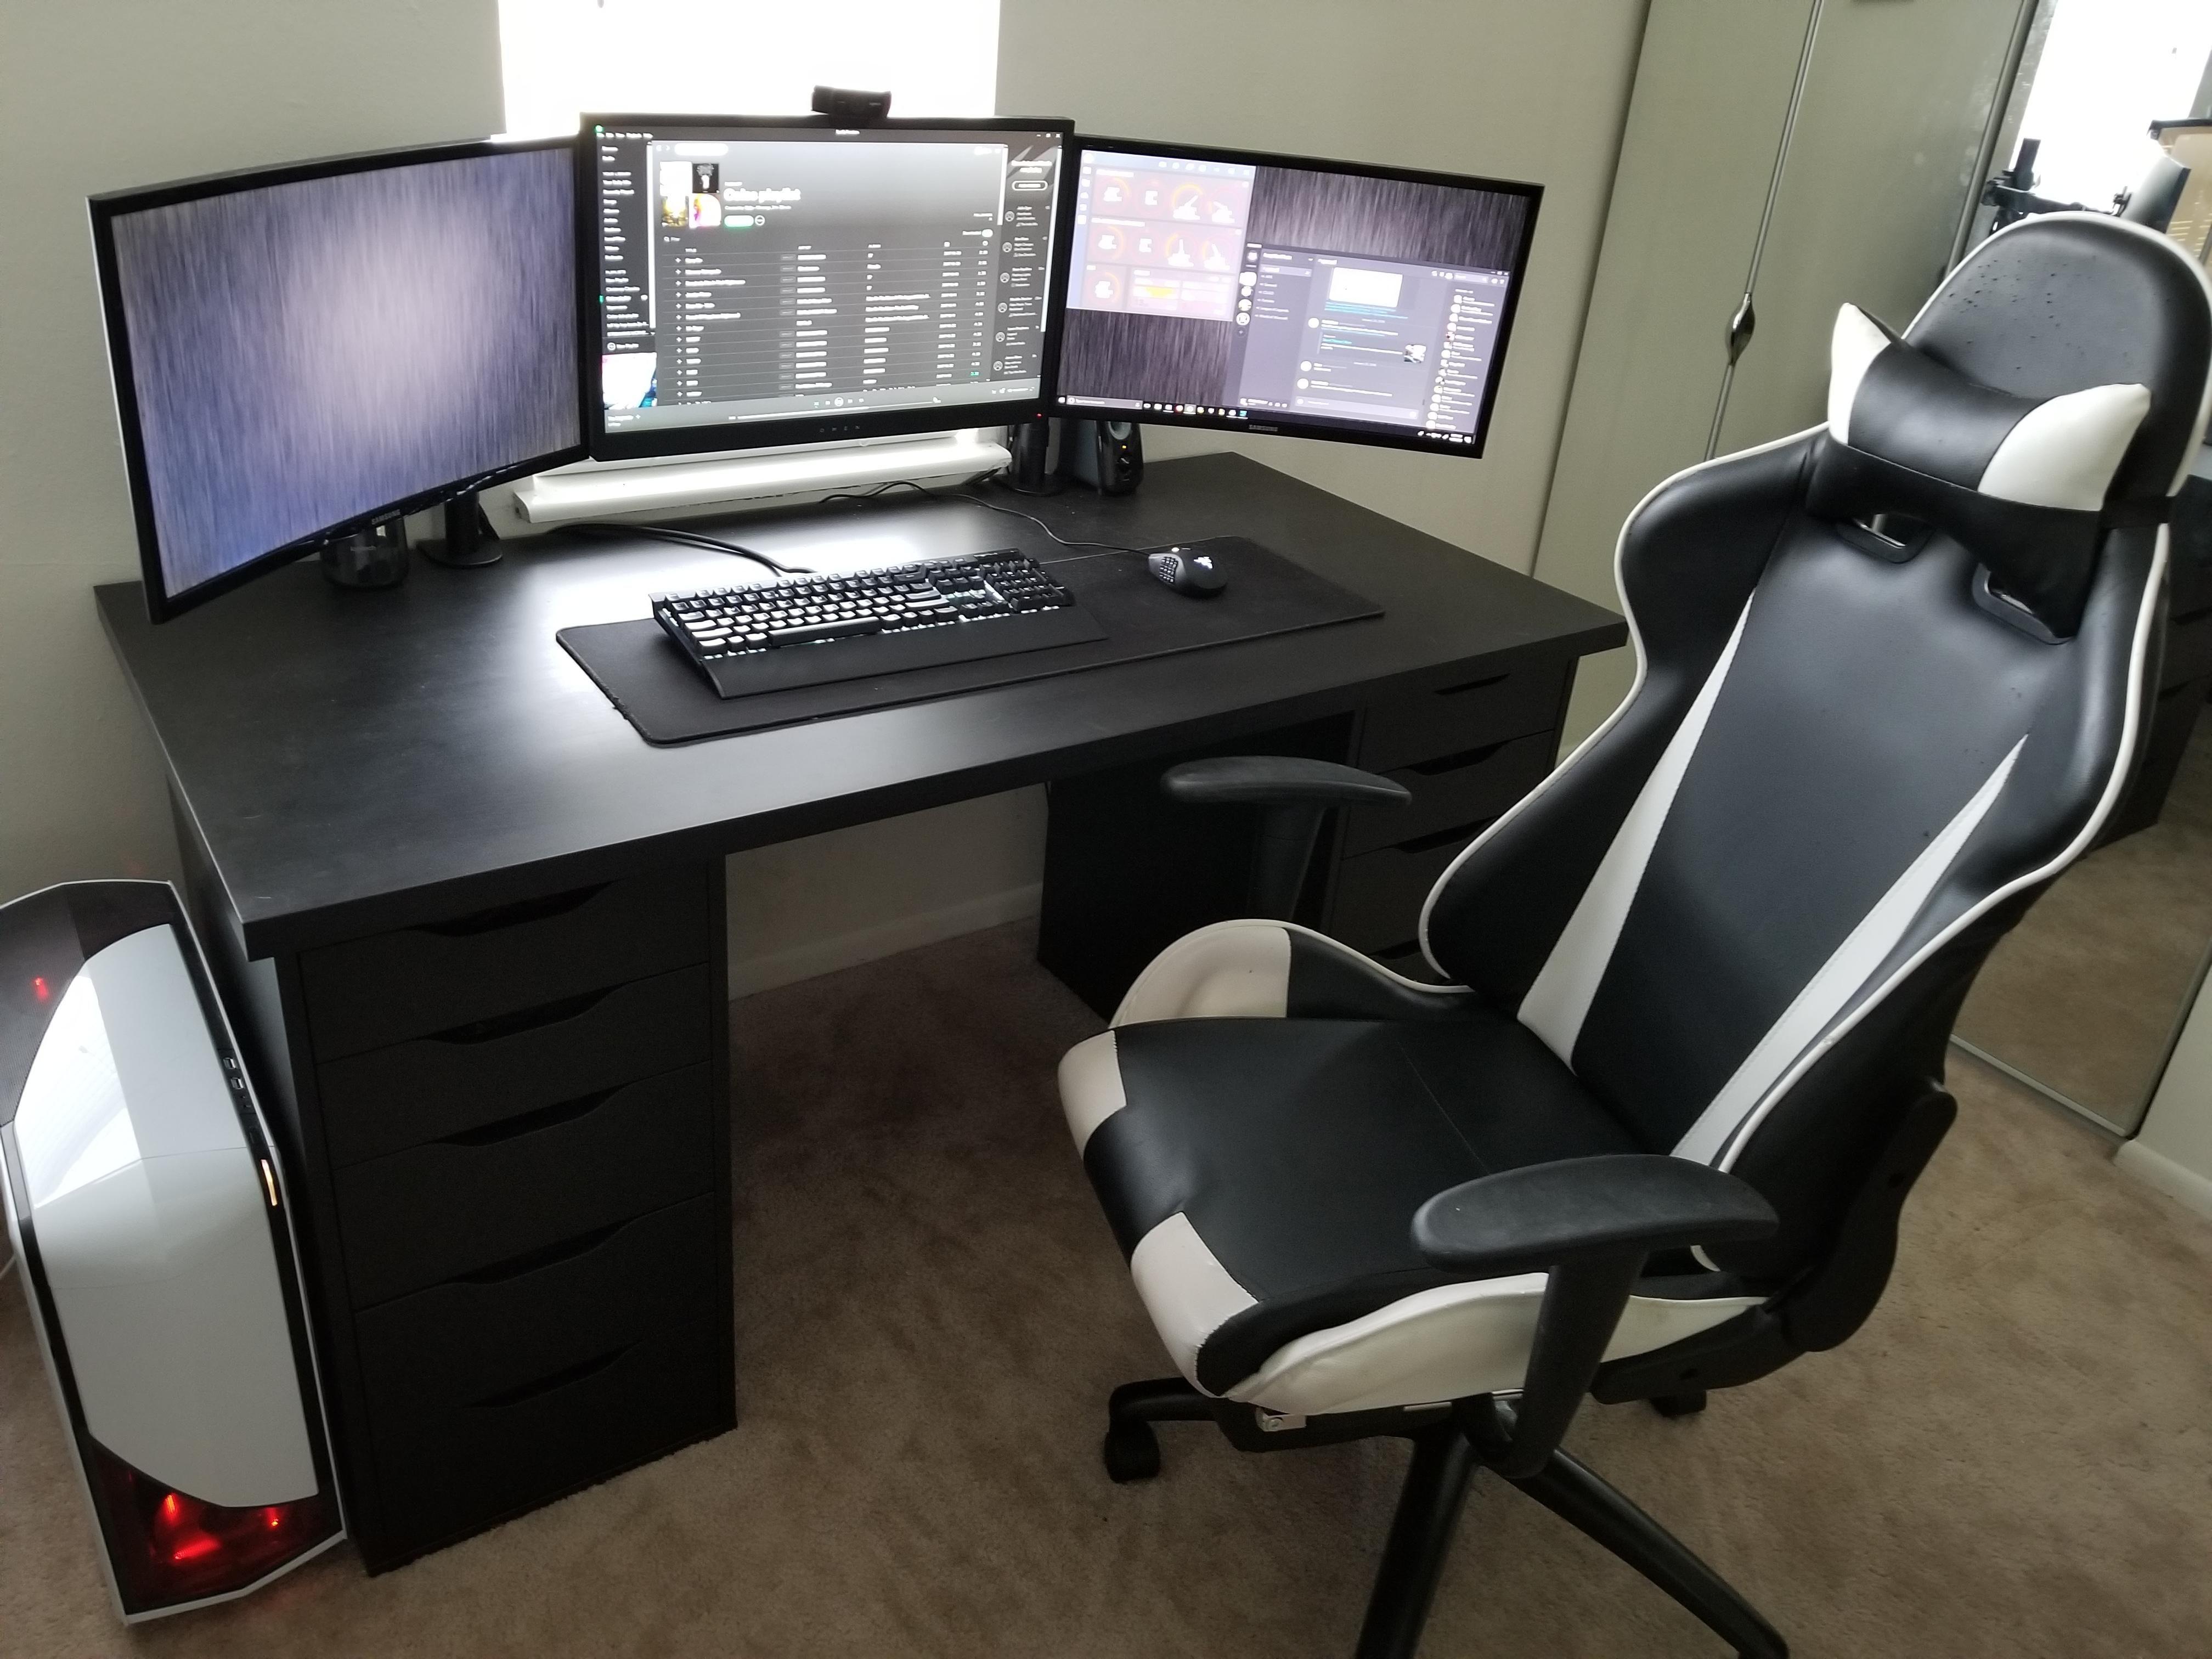 Http Ift Tt 2dq9gdk Post On Reddit Suggestions Welcome Desk Set Smart Home Design Office Desk Set